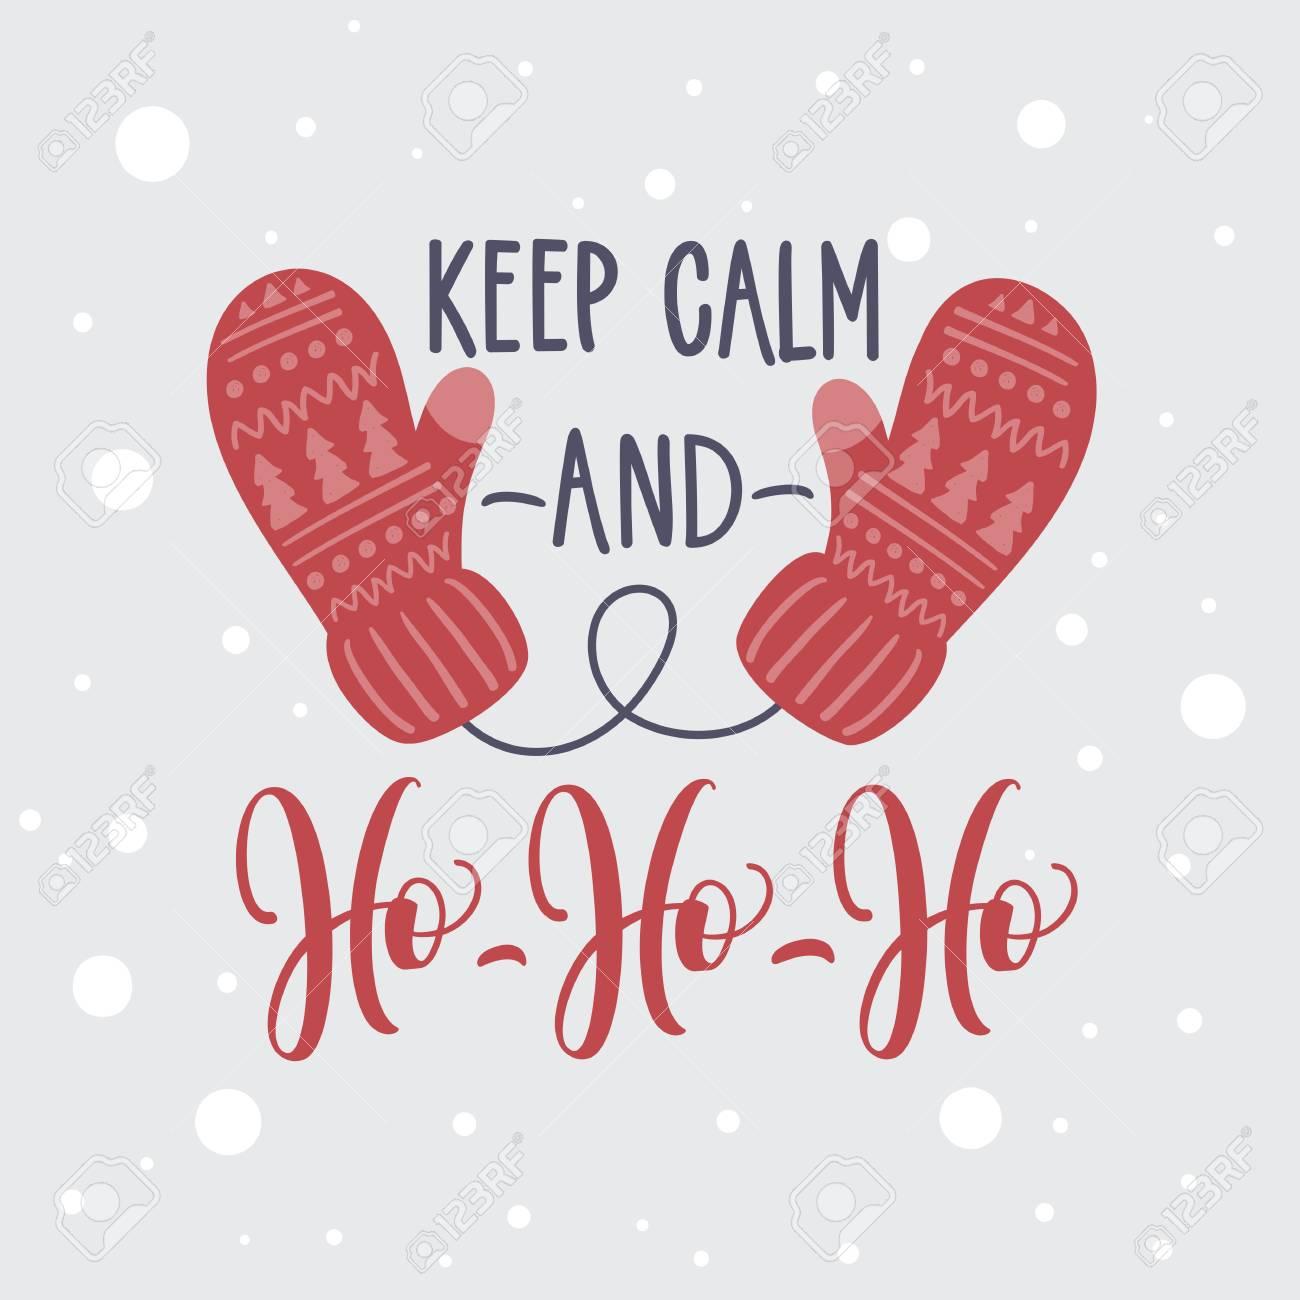 Christmas Card. Keep Calm And Ho Ho Ho. Royalty Free Cliparts ...